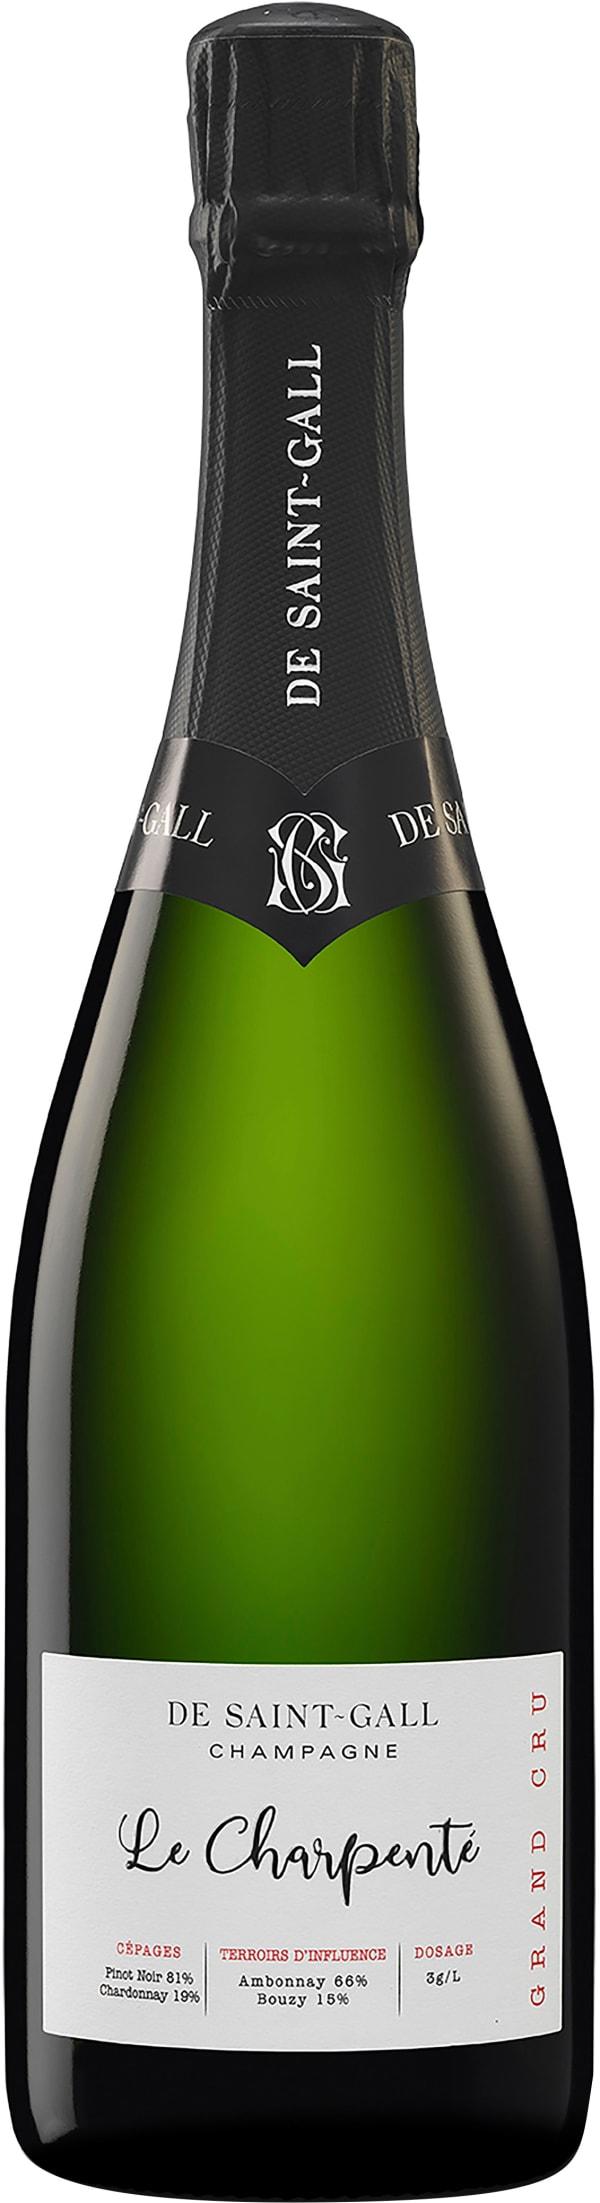 De Saint-Gall Le Charpenté Grand Cru Champagne Extra Brut